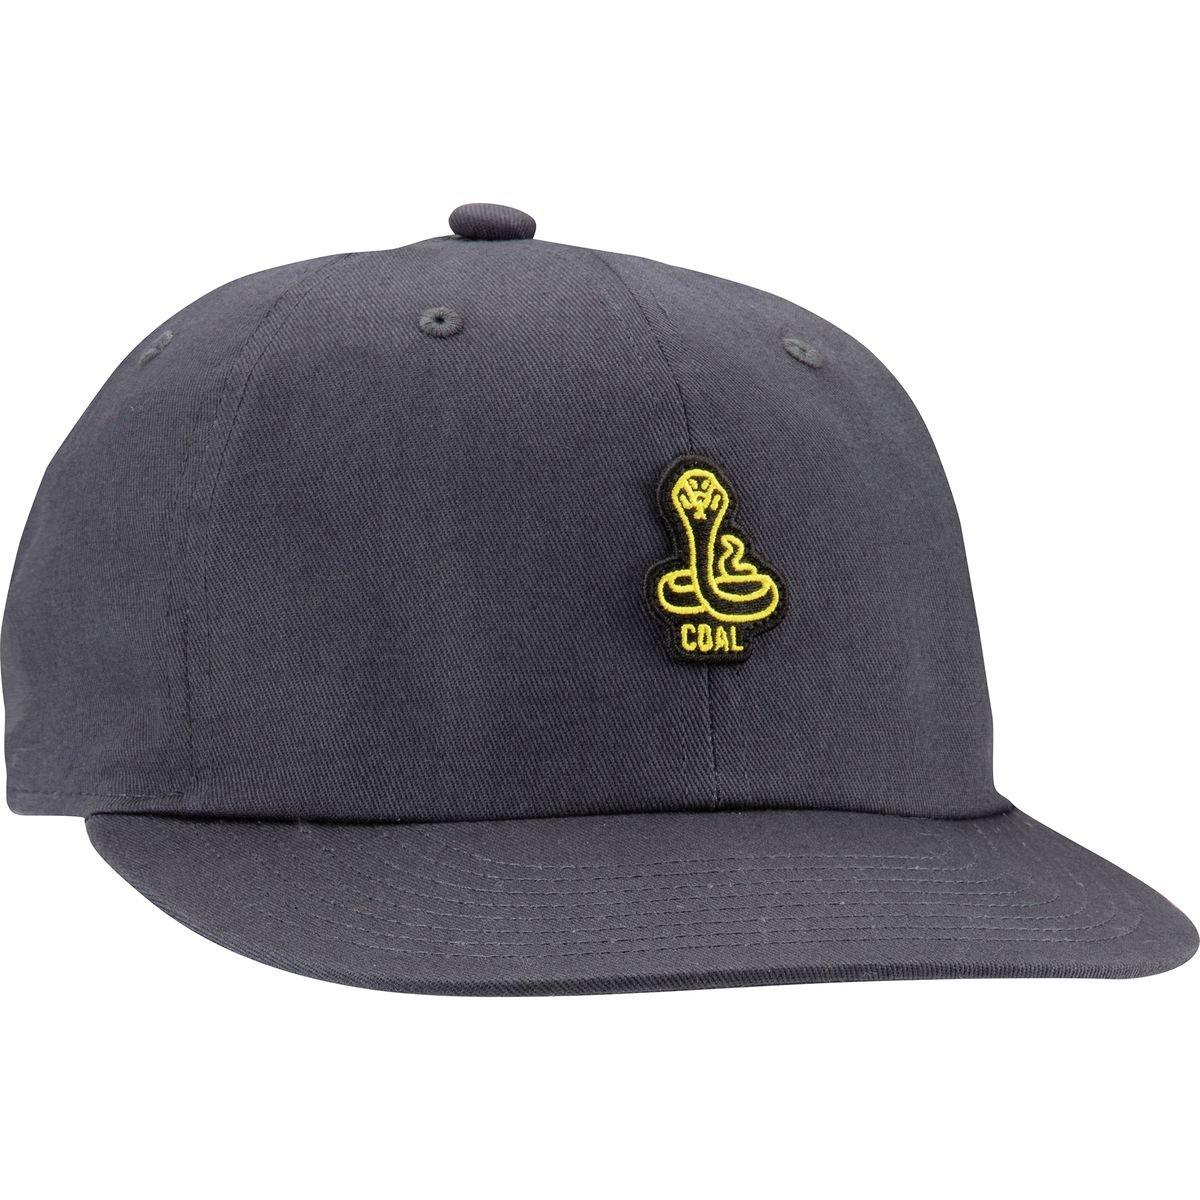 480834eb52c98c Amazon.com: Coal Men's The Junior Structureless Hat Adjustable Snapback  Cap, Charcoal, One Size: Clothing